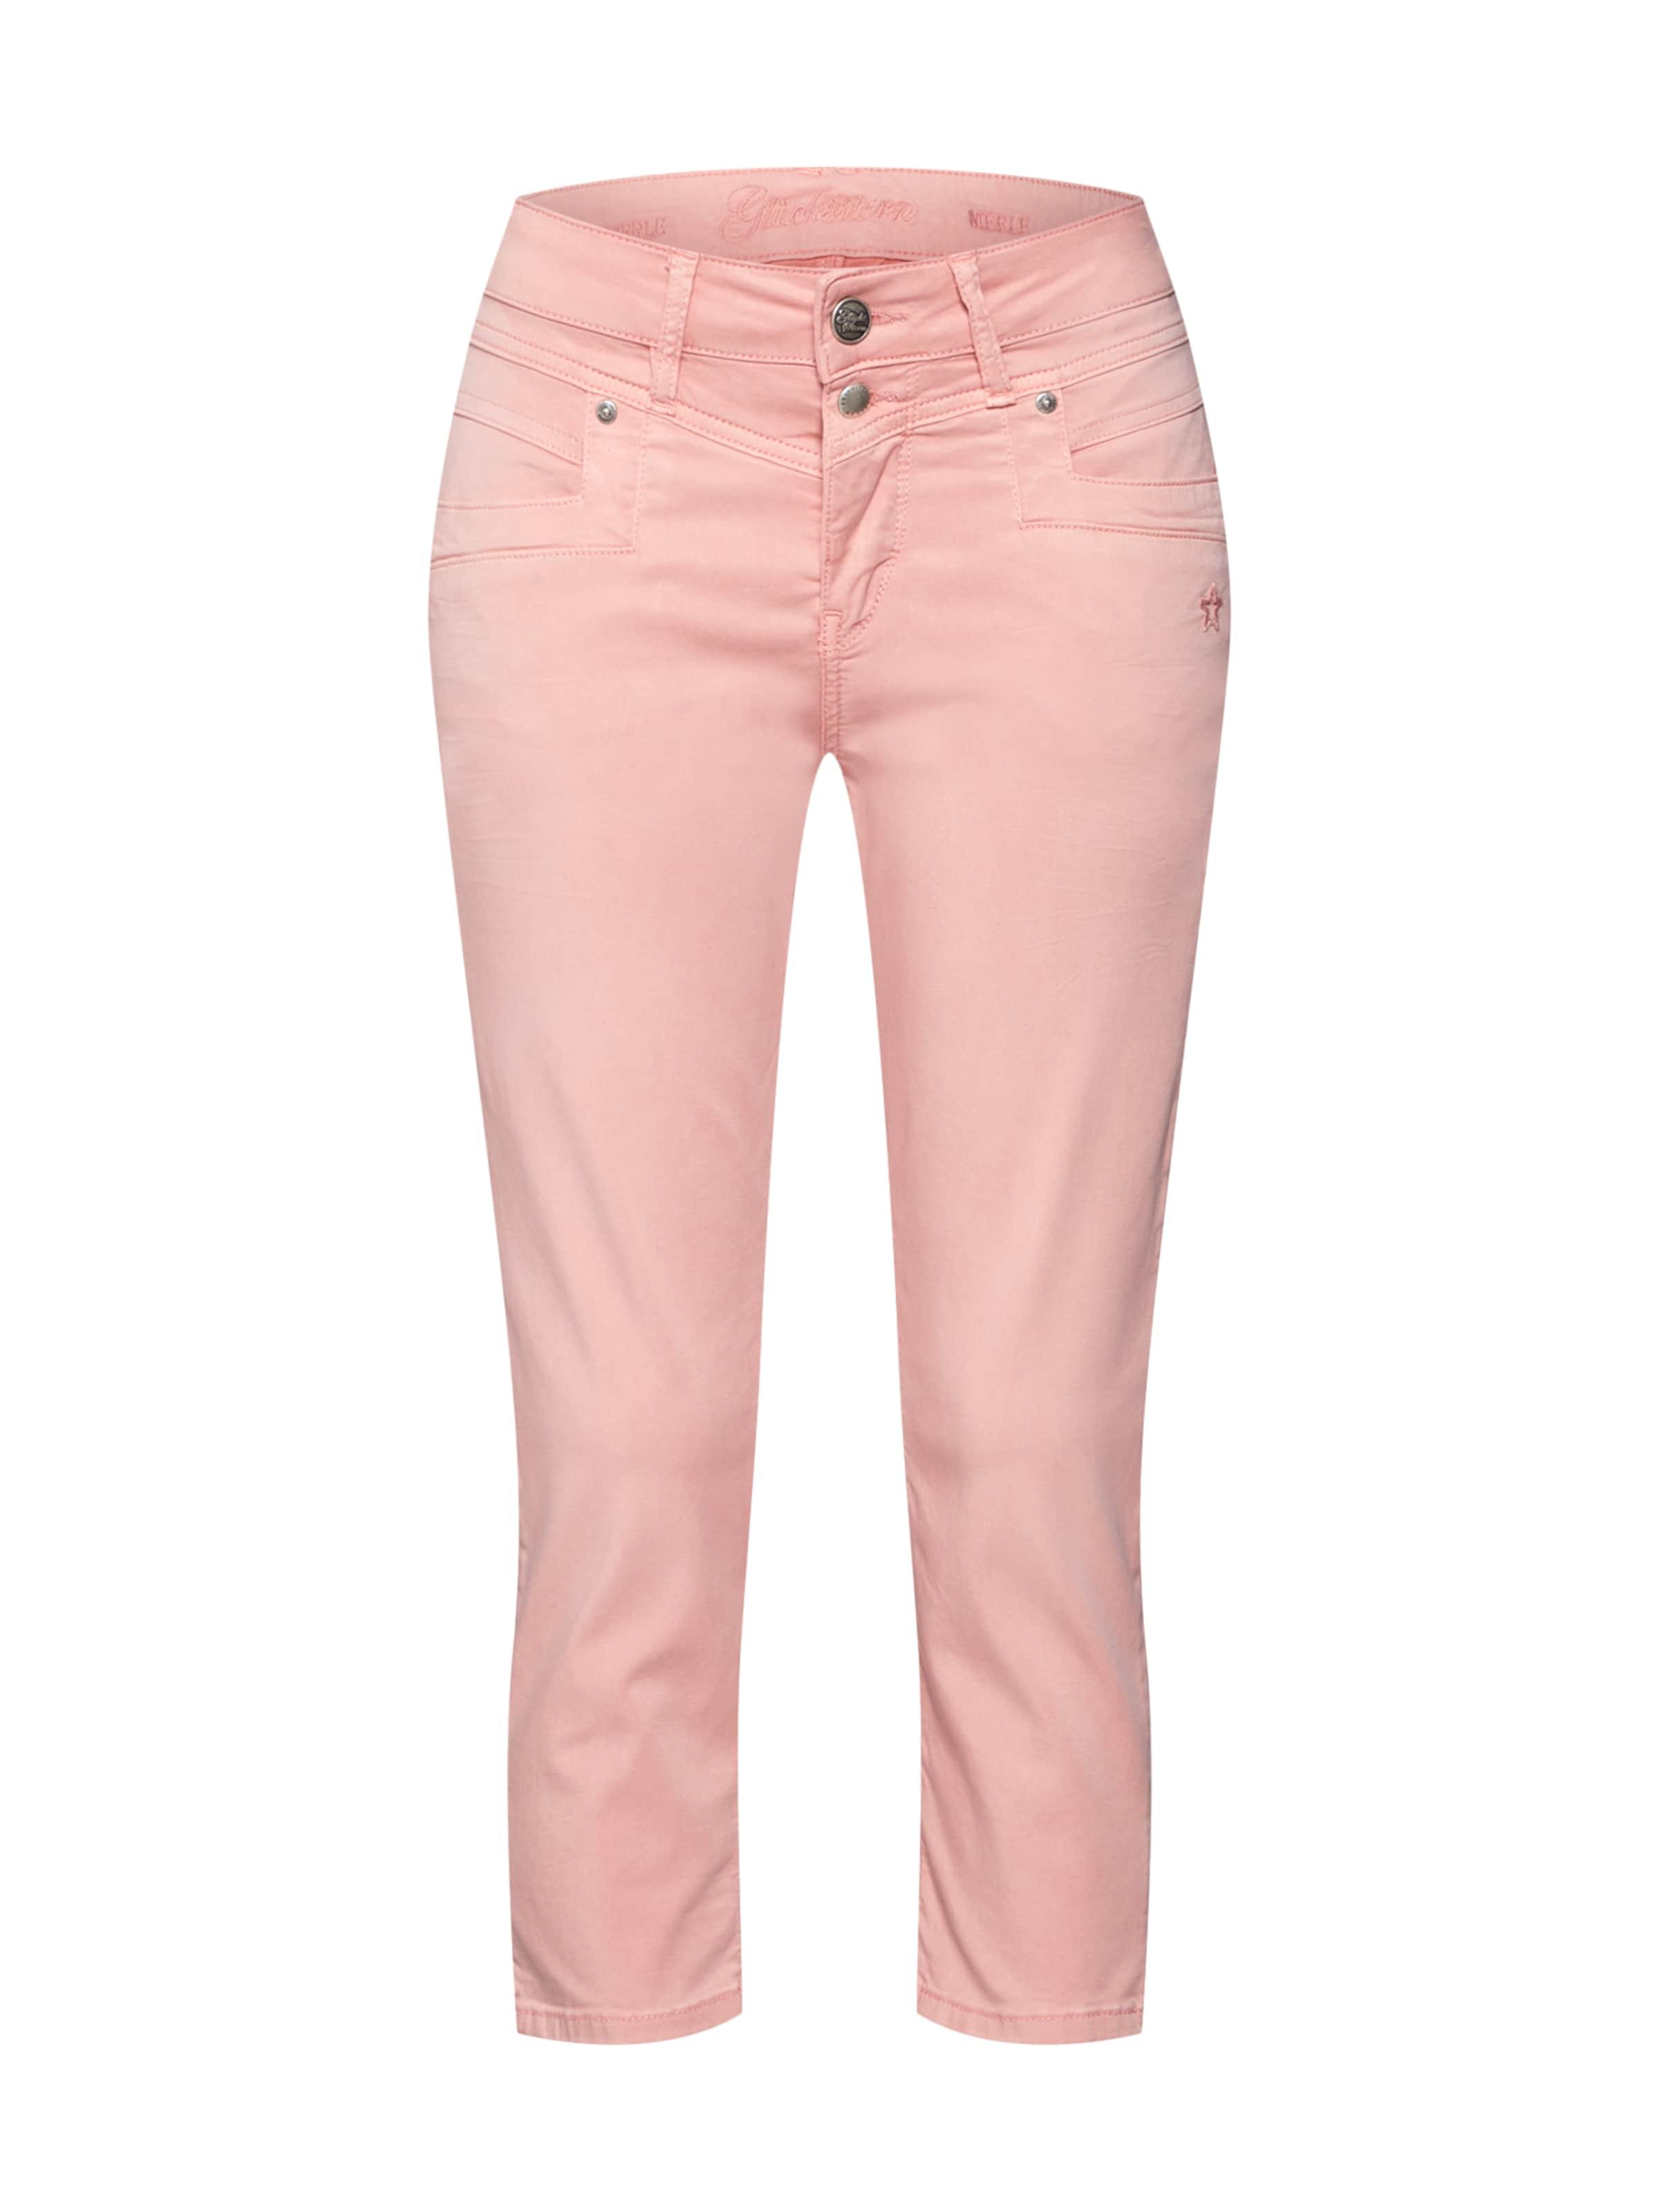 Glücksstern Rose 'merle' Pantalon Glücksstern Rose 'merle' En Pantalon En jc5qA4RL3